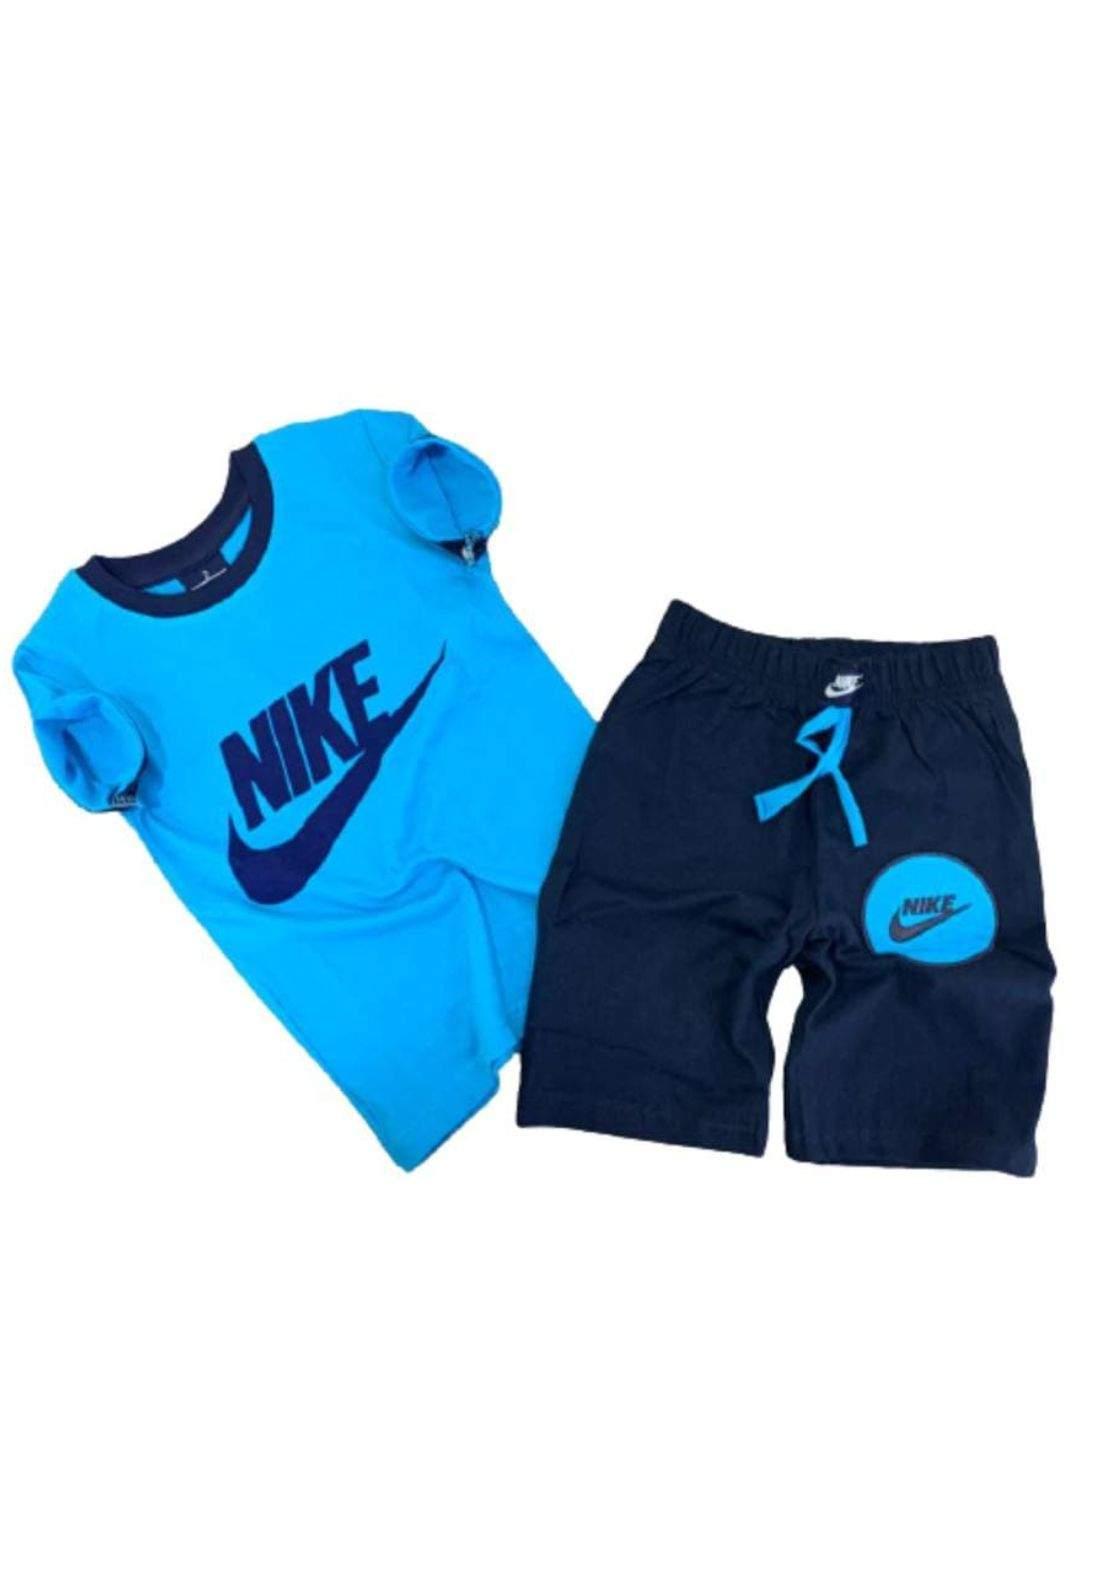 tracksuit for boys blue  (t-shirt+short) ( تراكسوت ولادي سمائي(شورت و تيشيرت